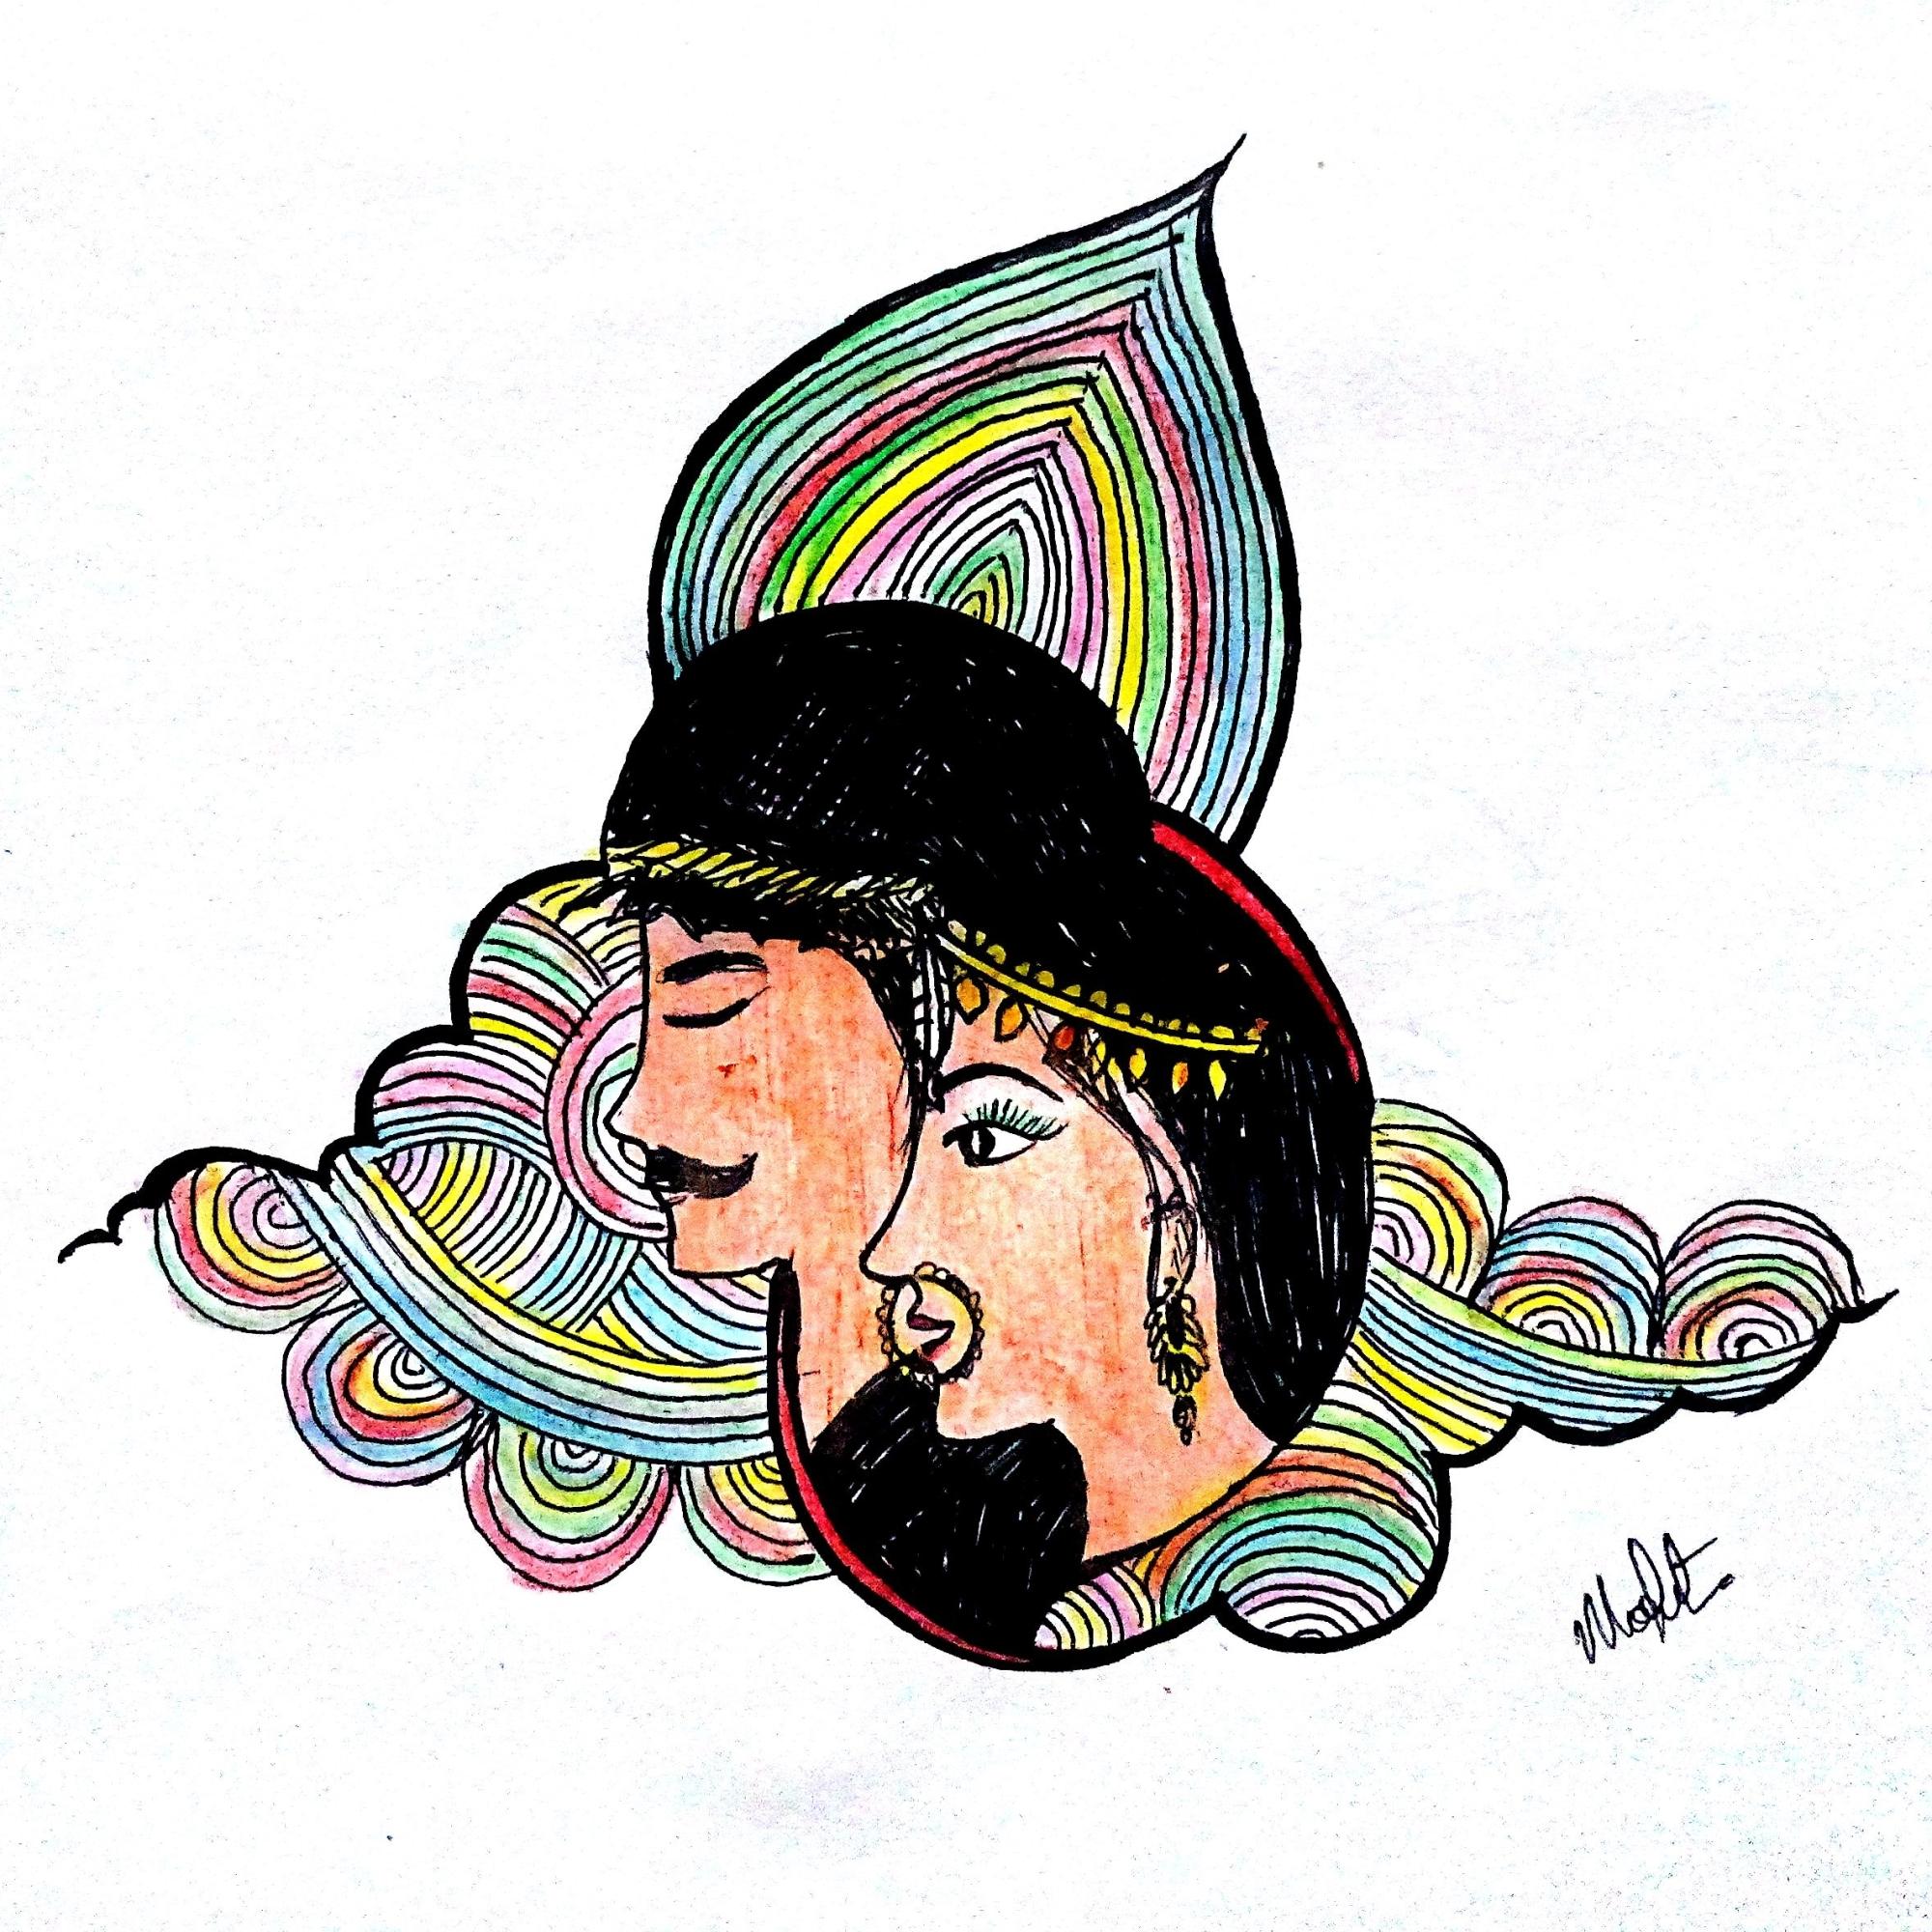 Illustrated by Modita Kathpalia.